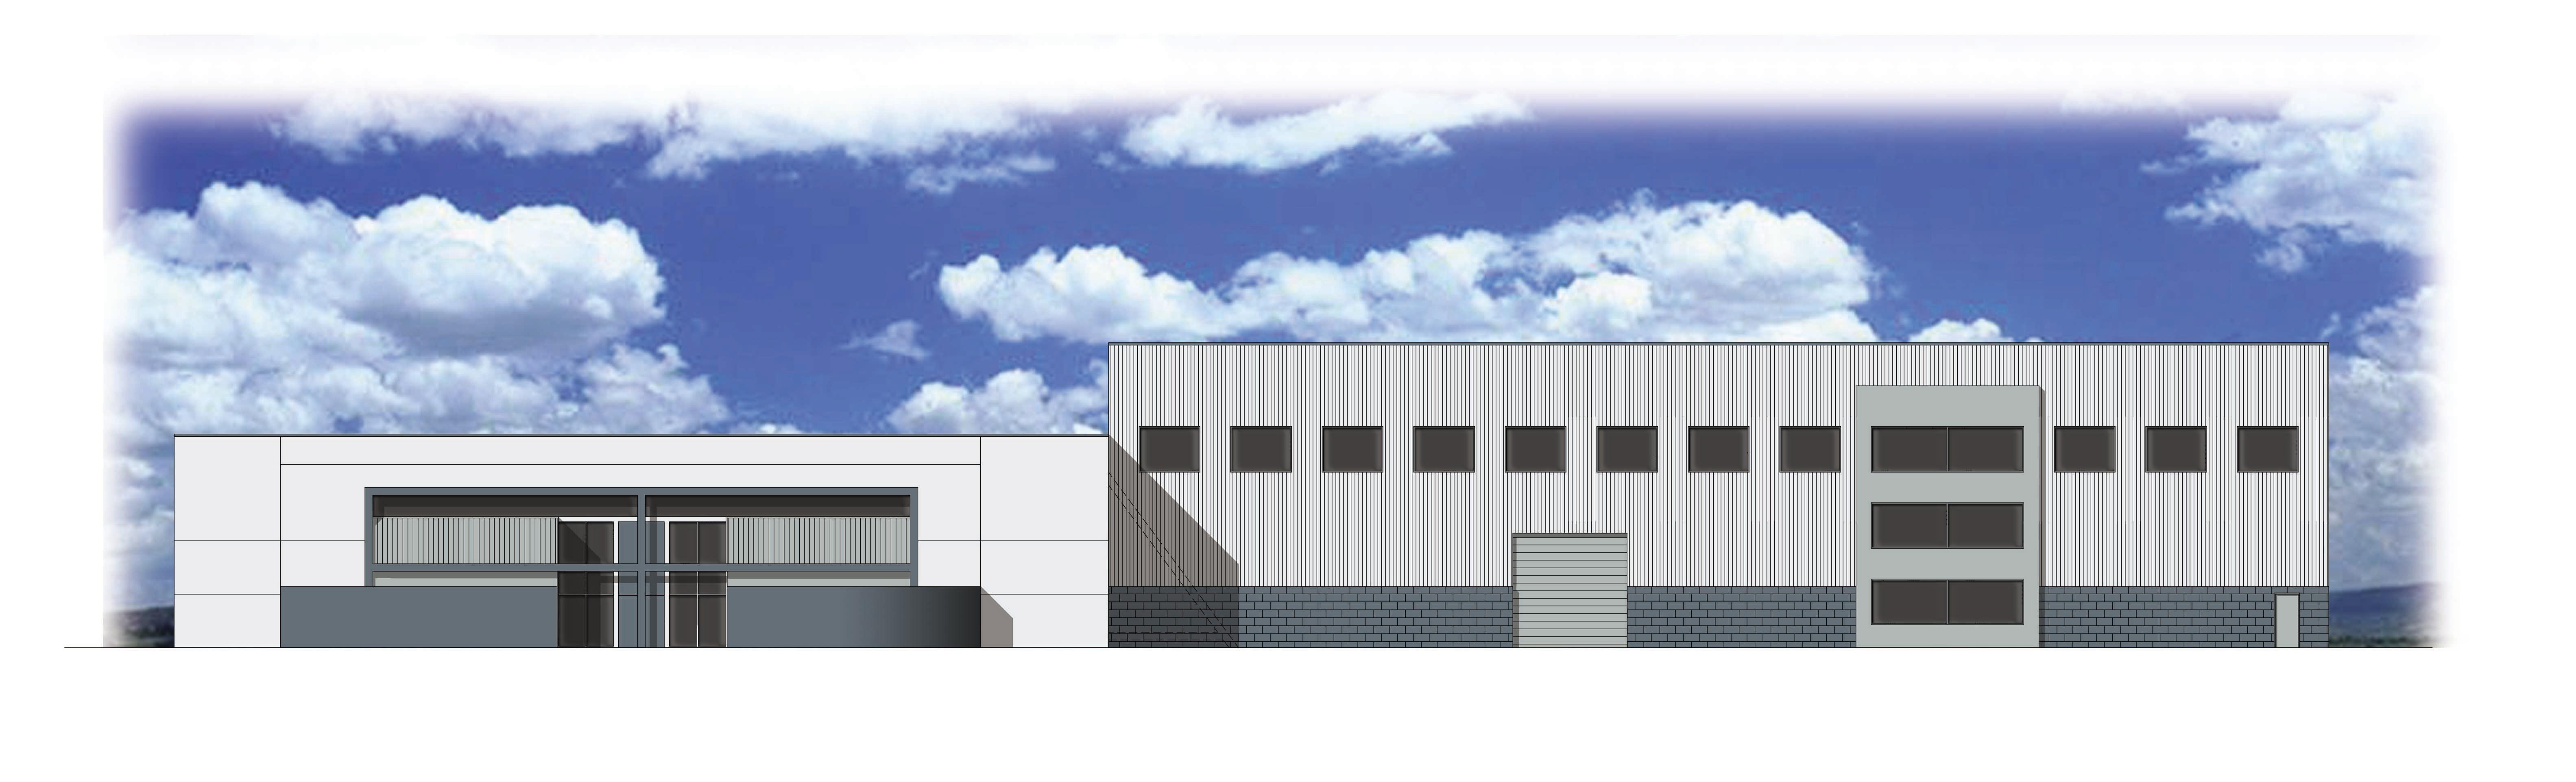 warehouse building elevations joy studio design gallery